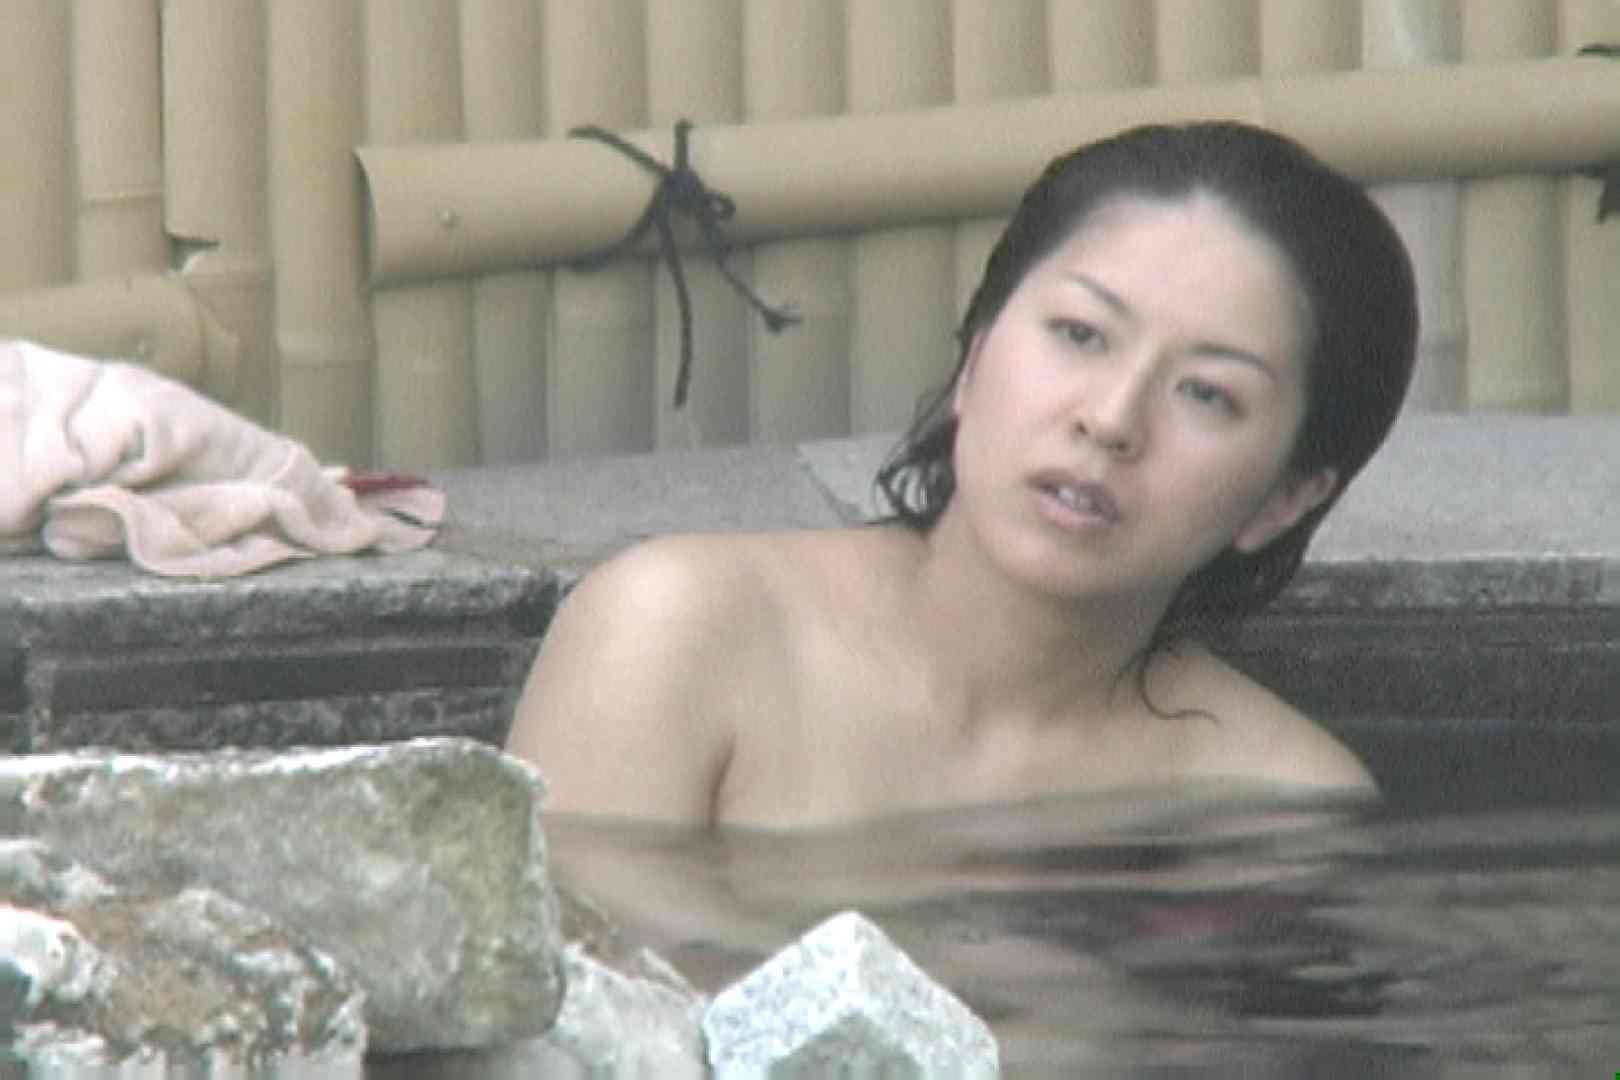 Aquaな露天風呂Vol.694 盗撮 AV無料 67画像 59